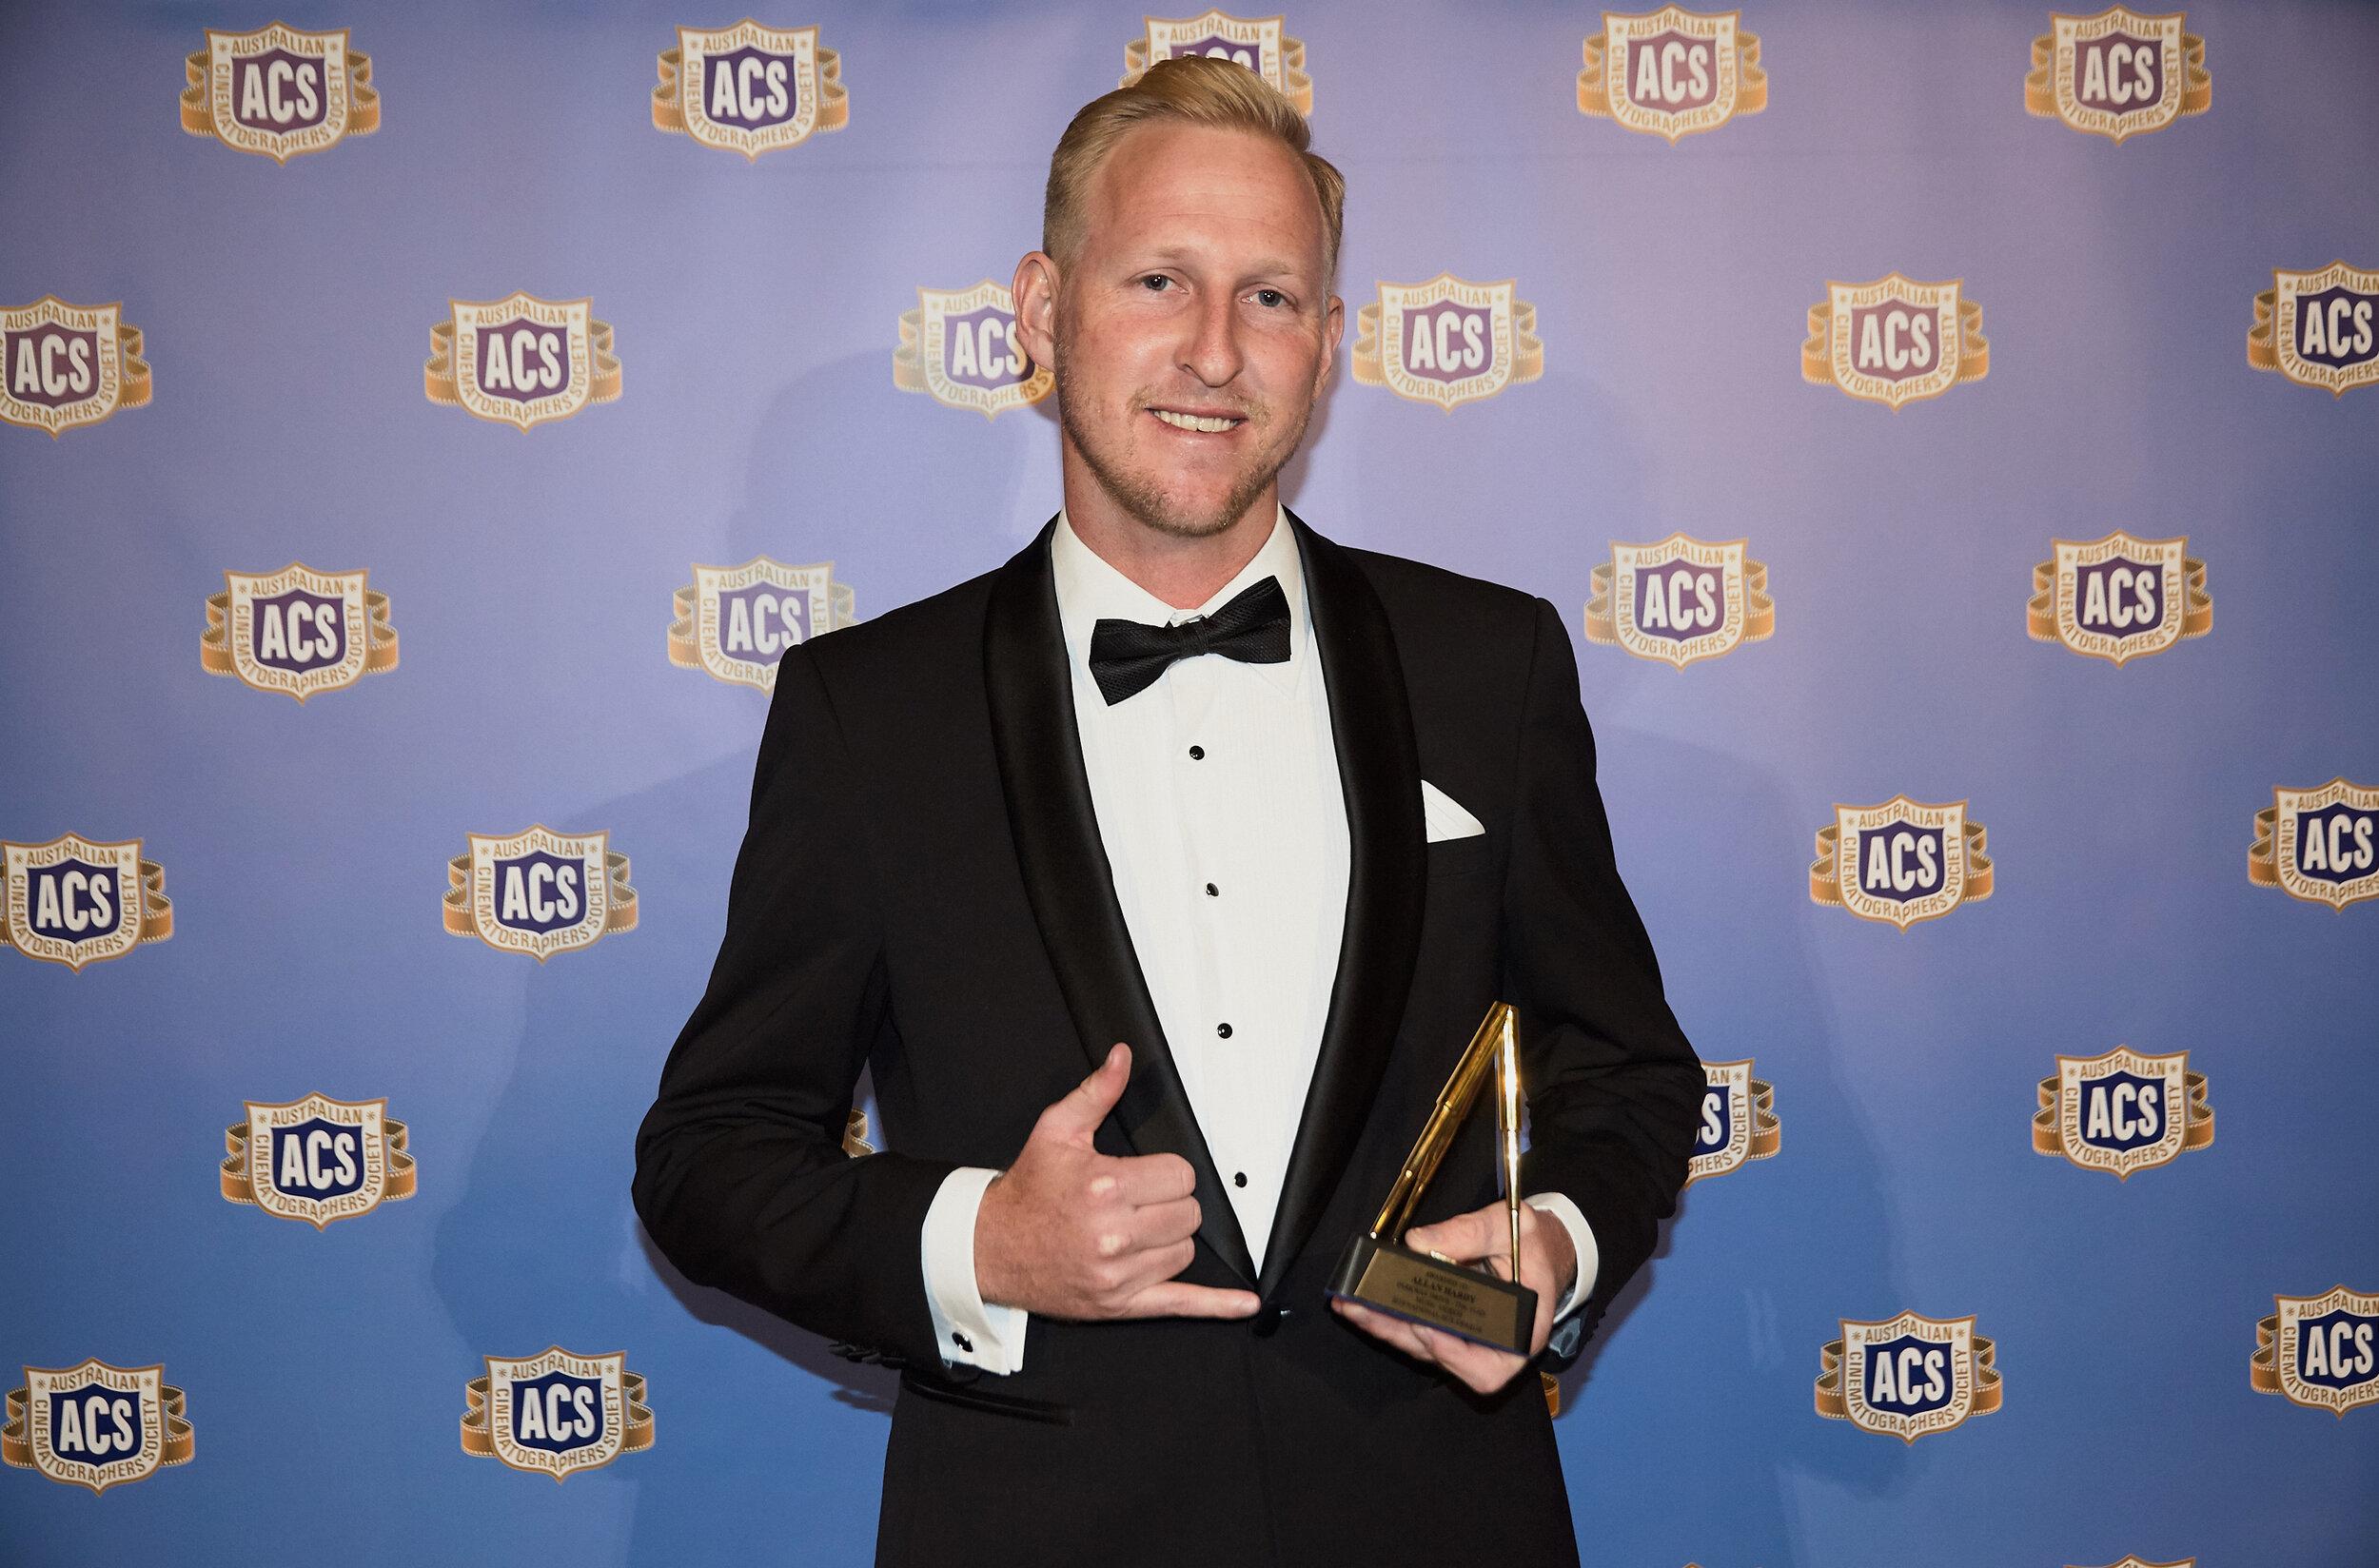 ACS_National_Awards_2019_152.jpg